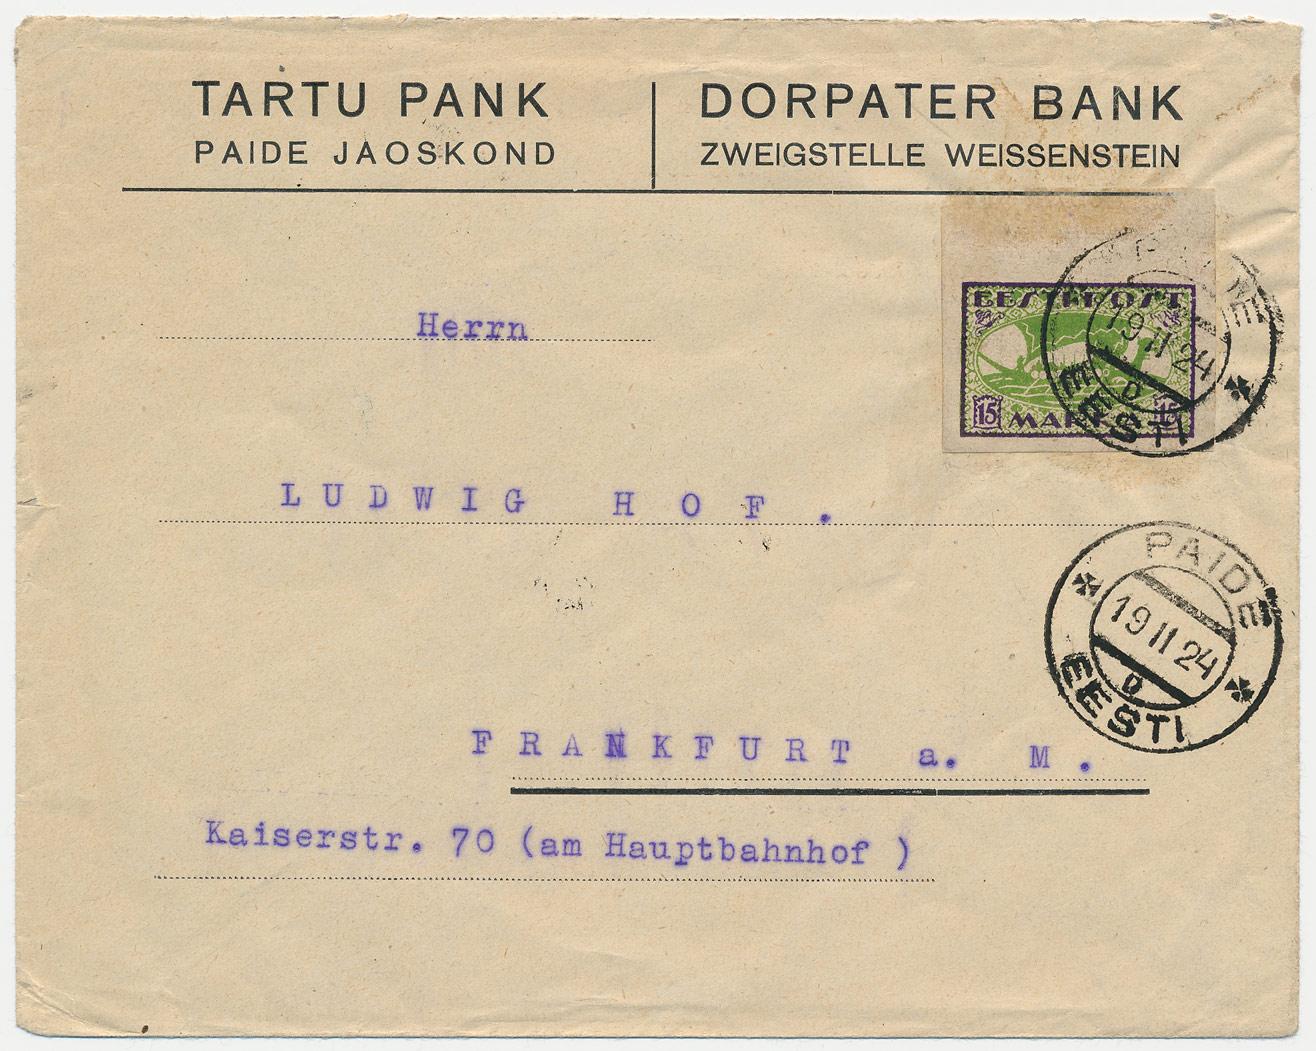 0178a-Viikingilaev-Tartu-Pank-Paide-Frankfurt-19-02-1924